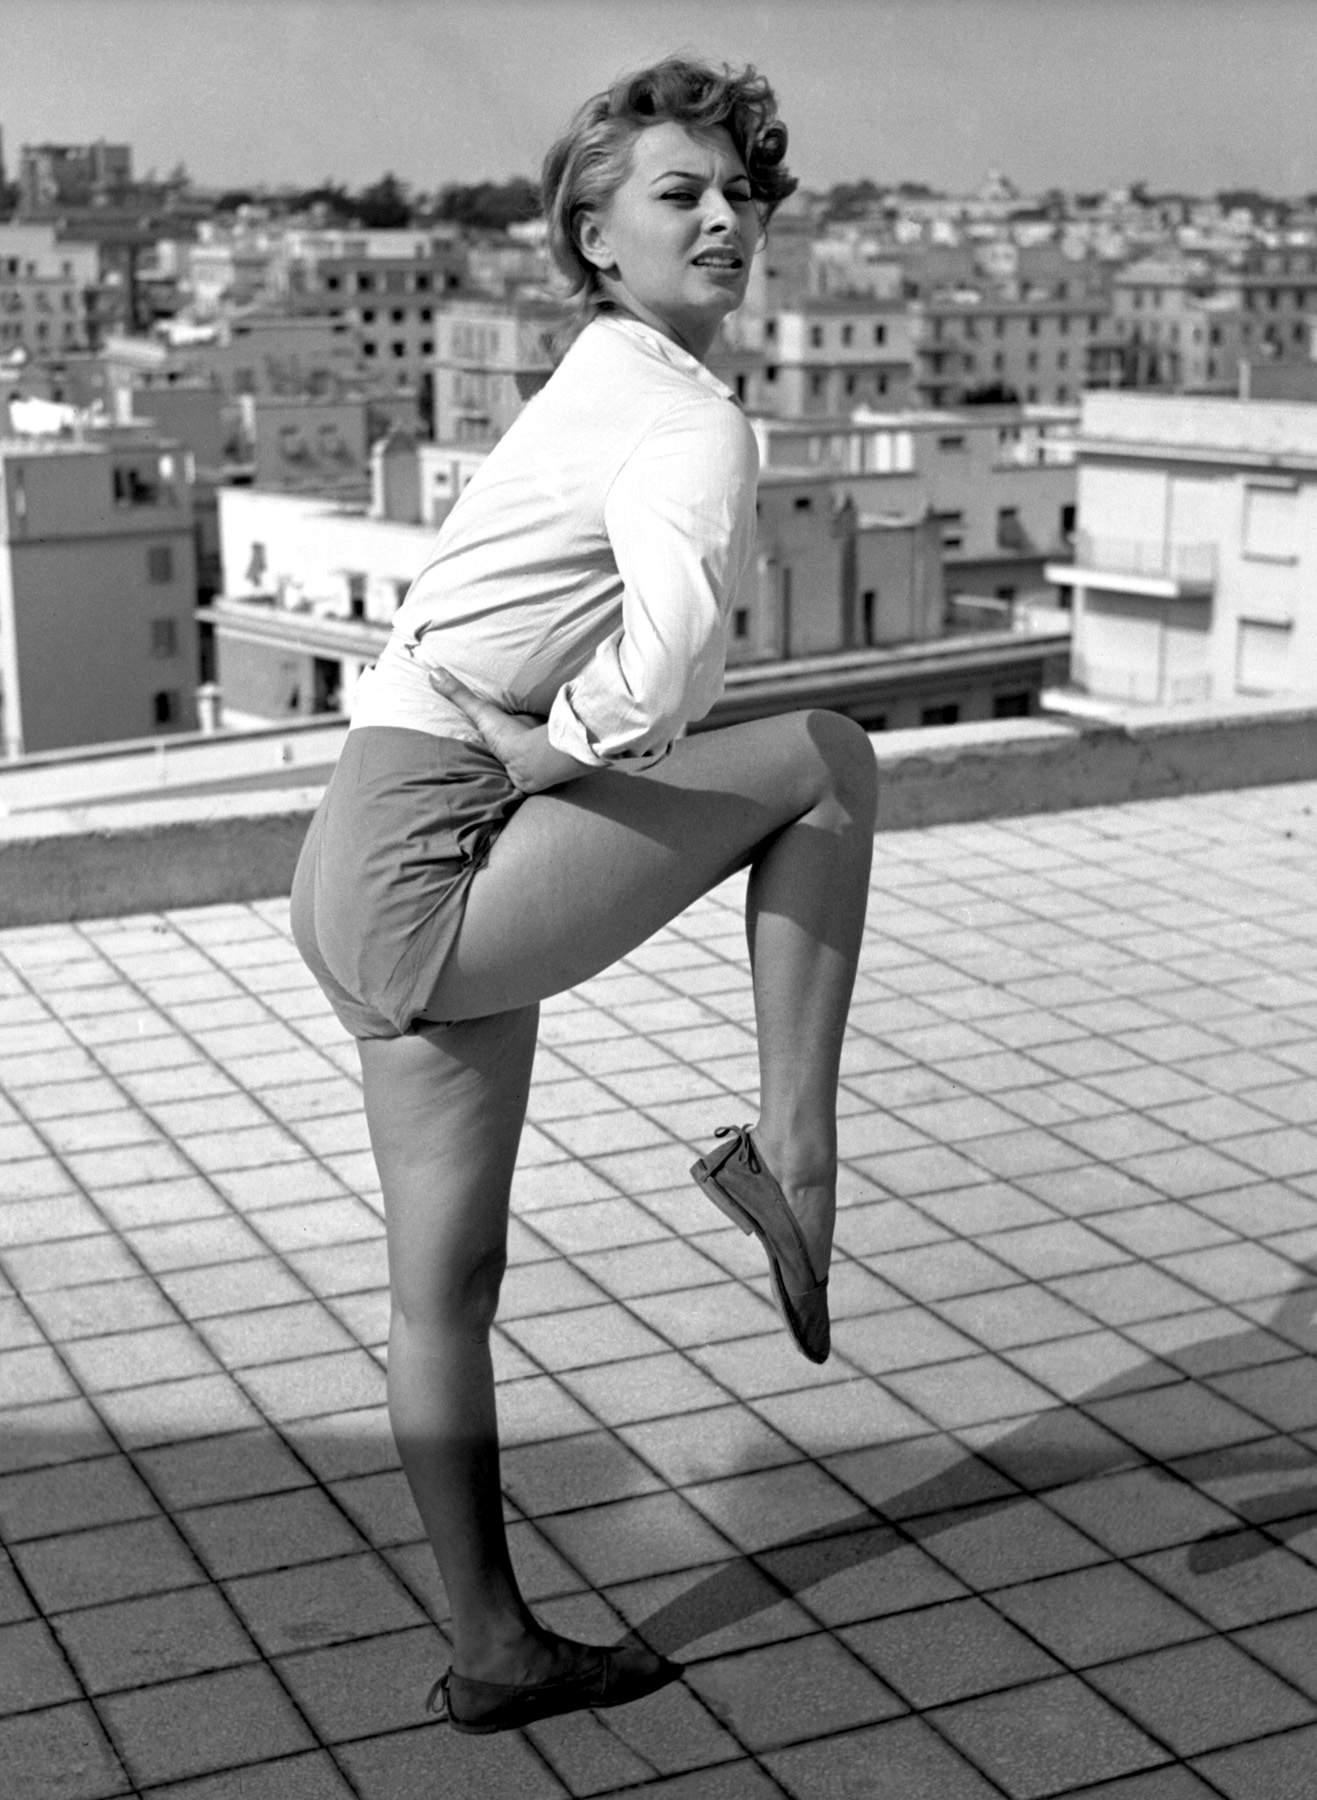 Софи Лорен/Sophia Loren - Страница 2 285443f0fbbb